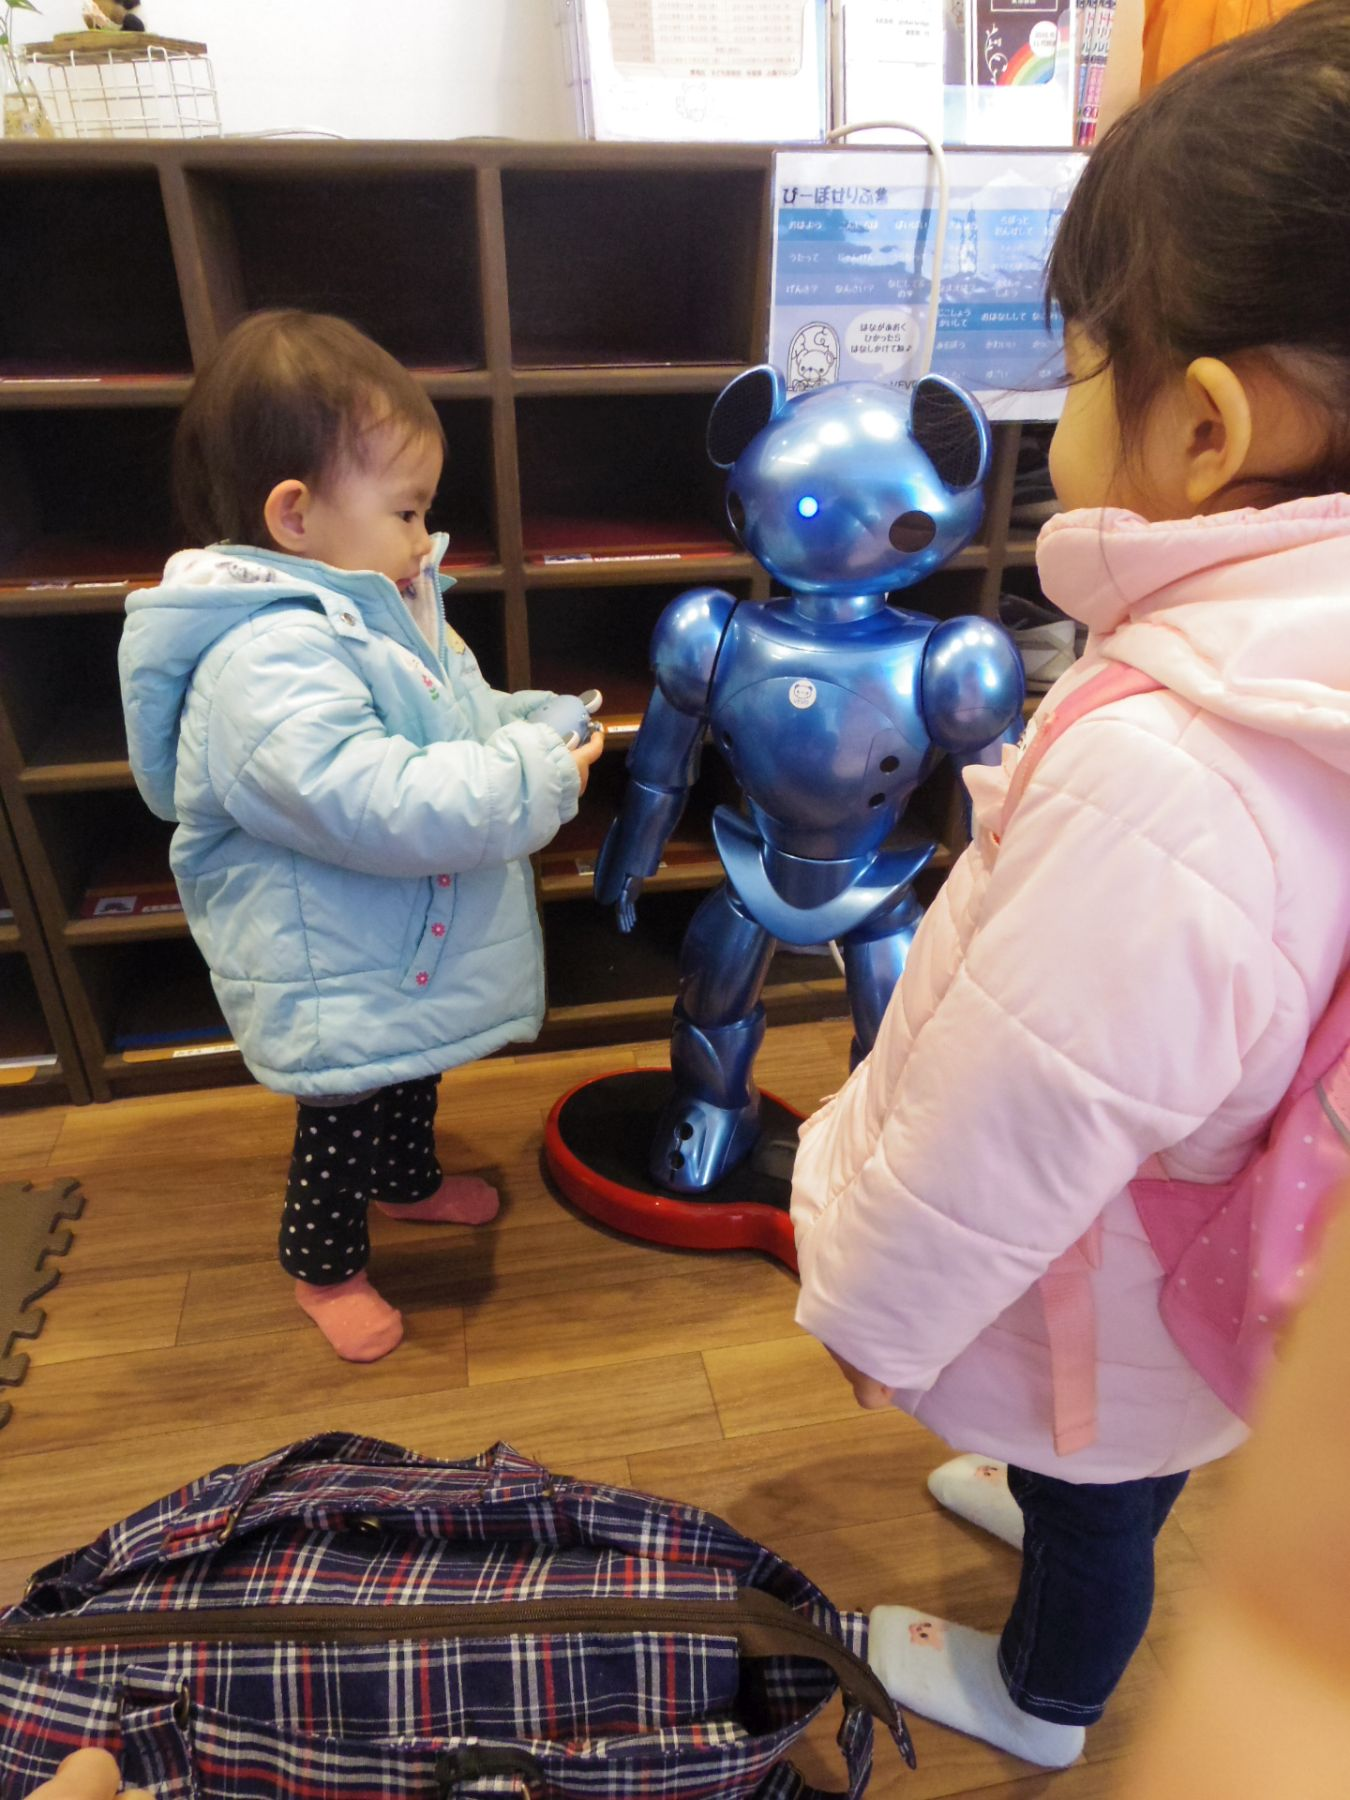 Japan Nursery School AI Robots 007